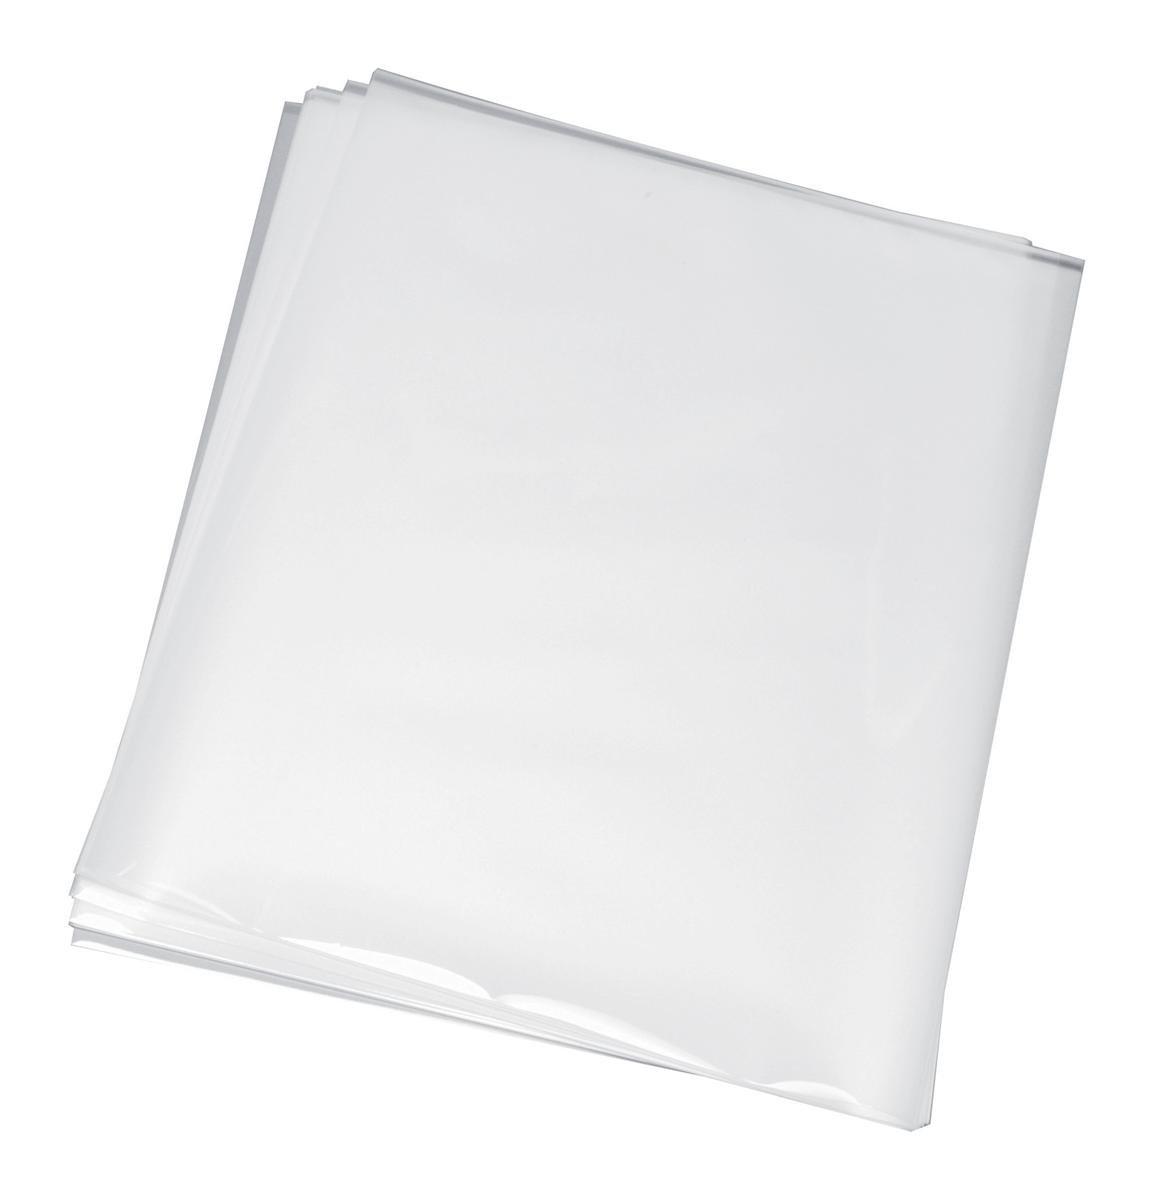 150 Micron Laminating Pouches Ref: 48017 Swordfish A4 2x75 Box of 100